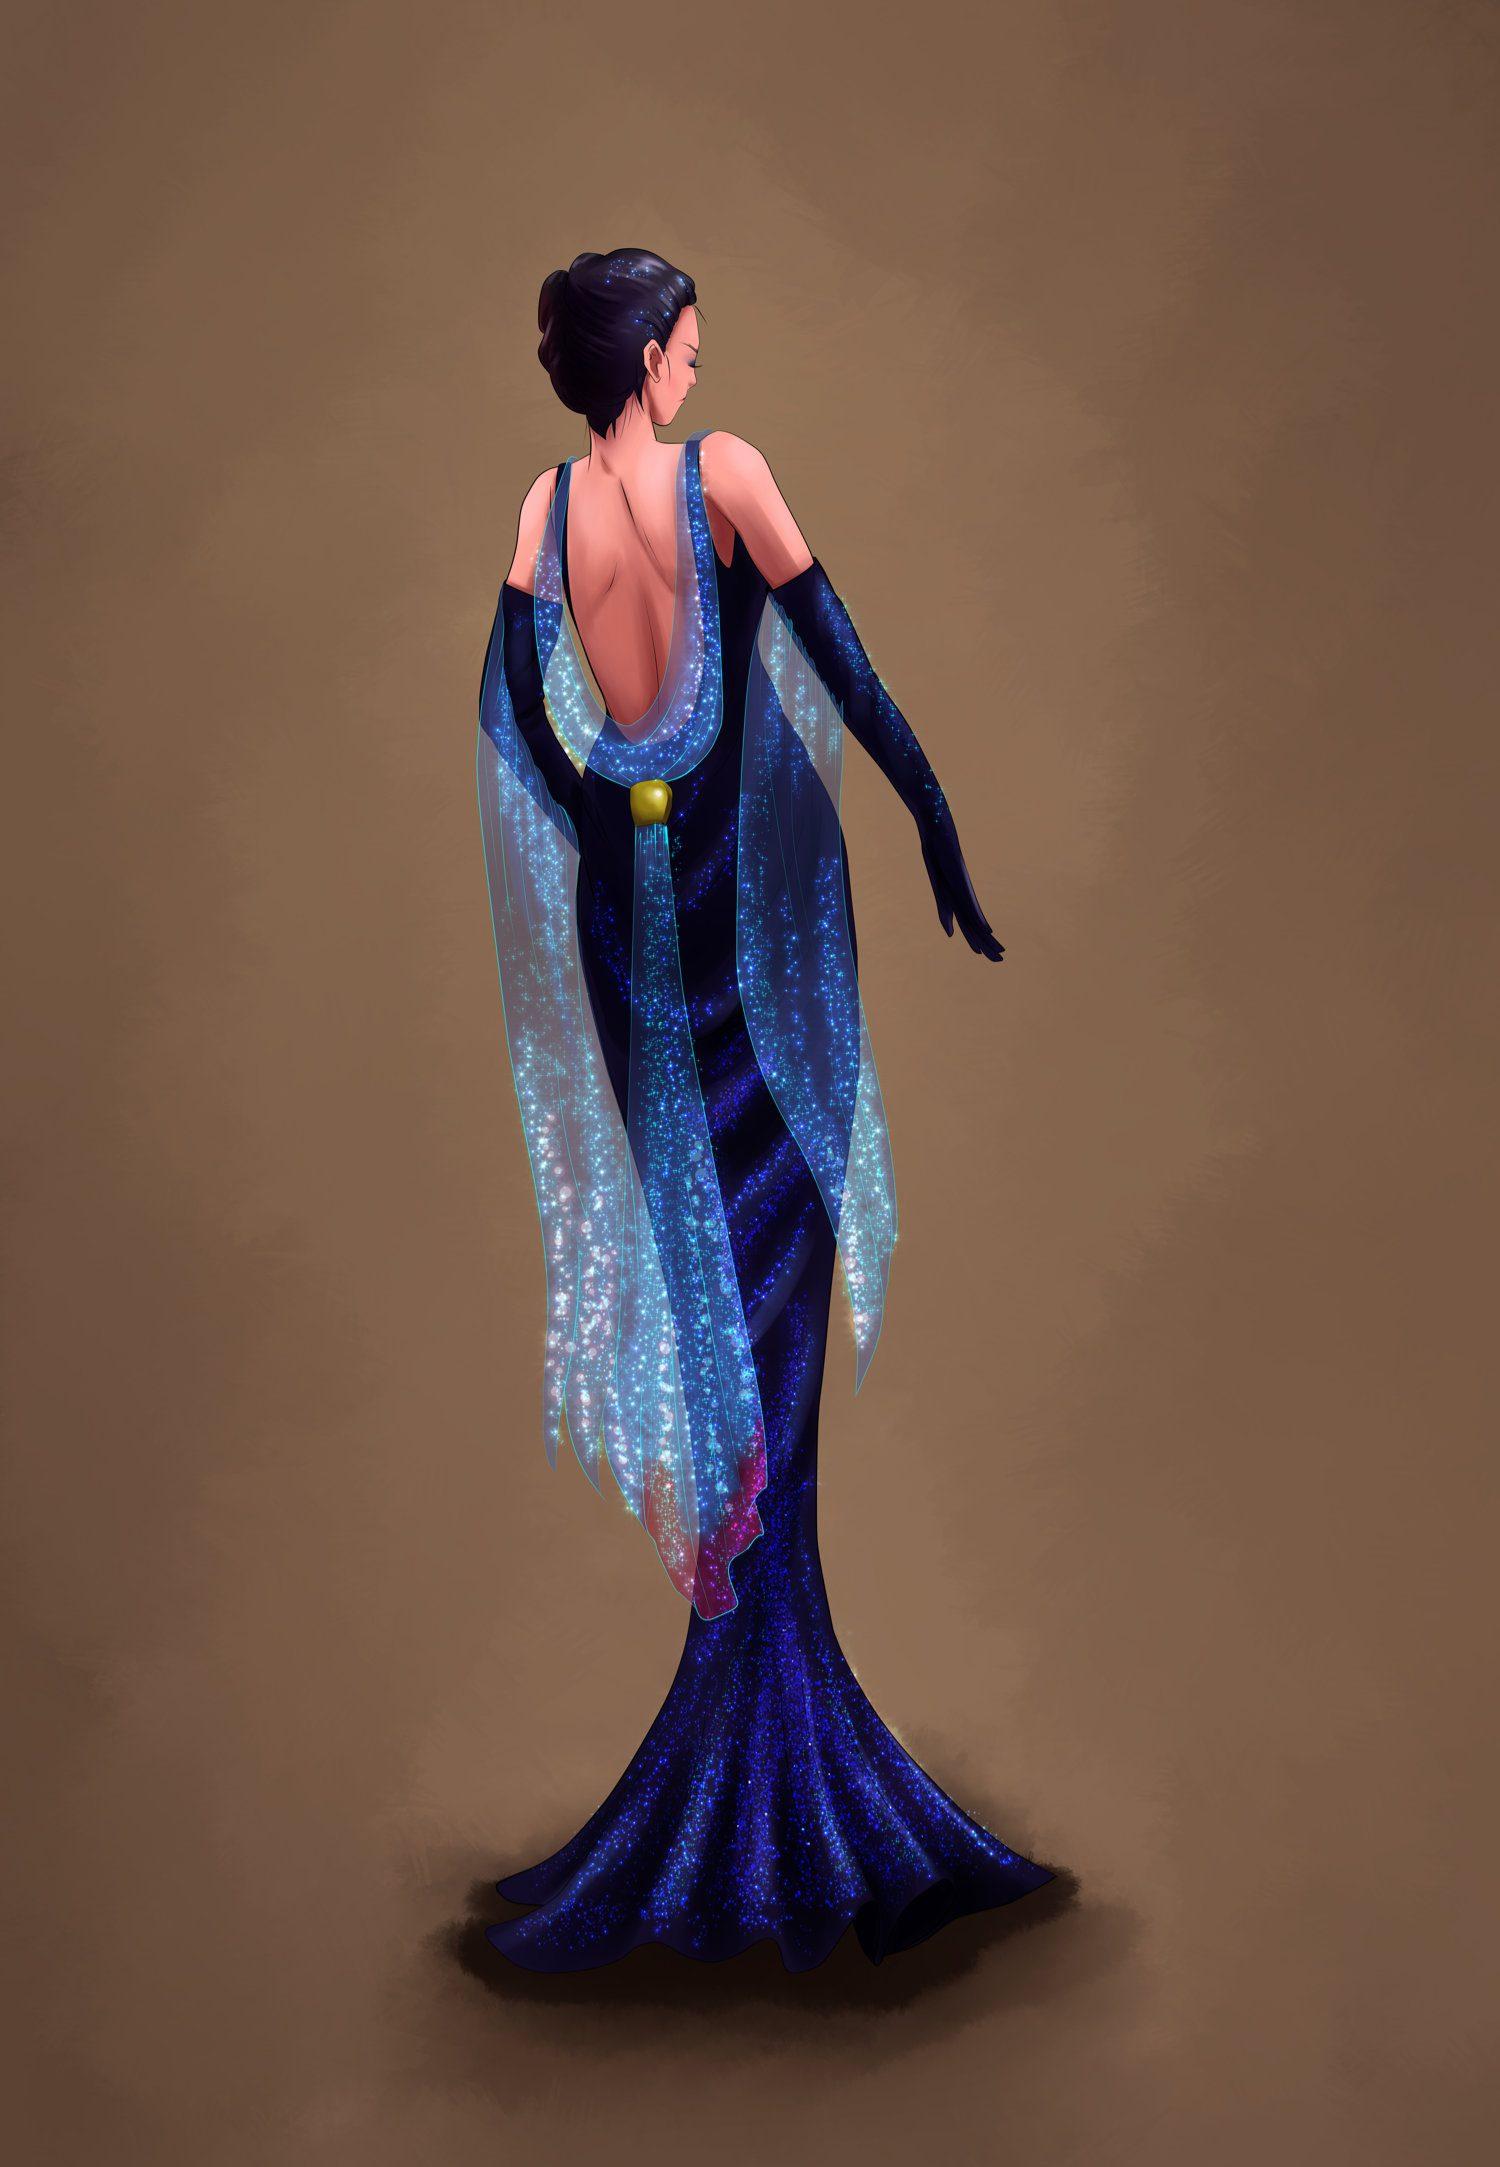 Nightshade Nora Glow-Up betta inspired dress made in Clip Studio Paint.